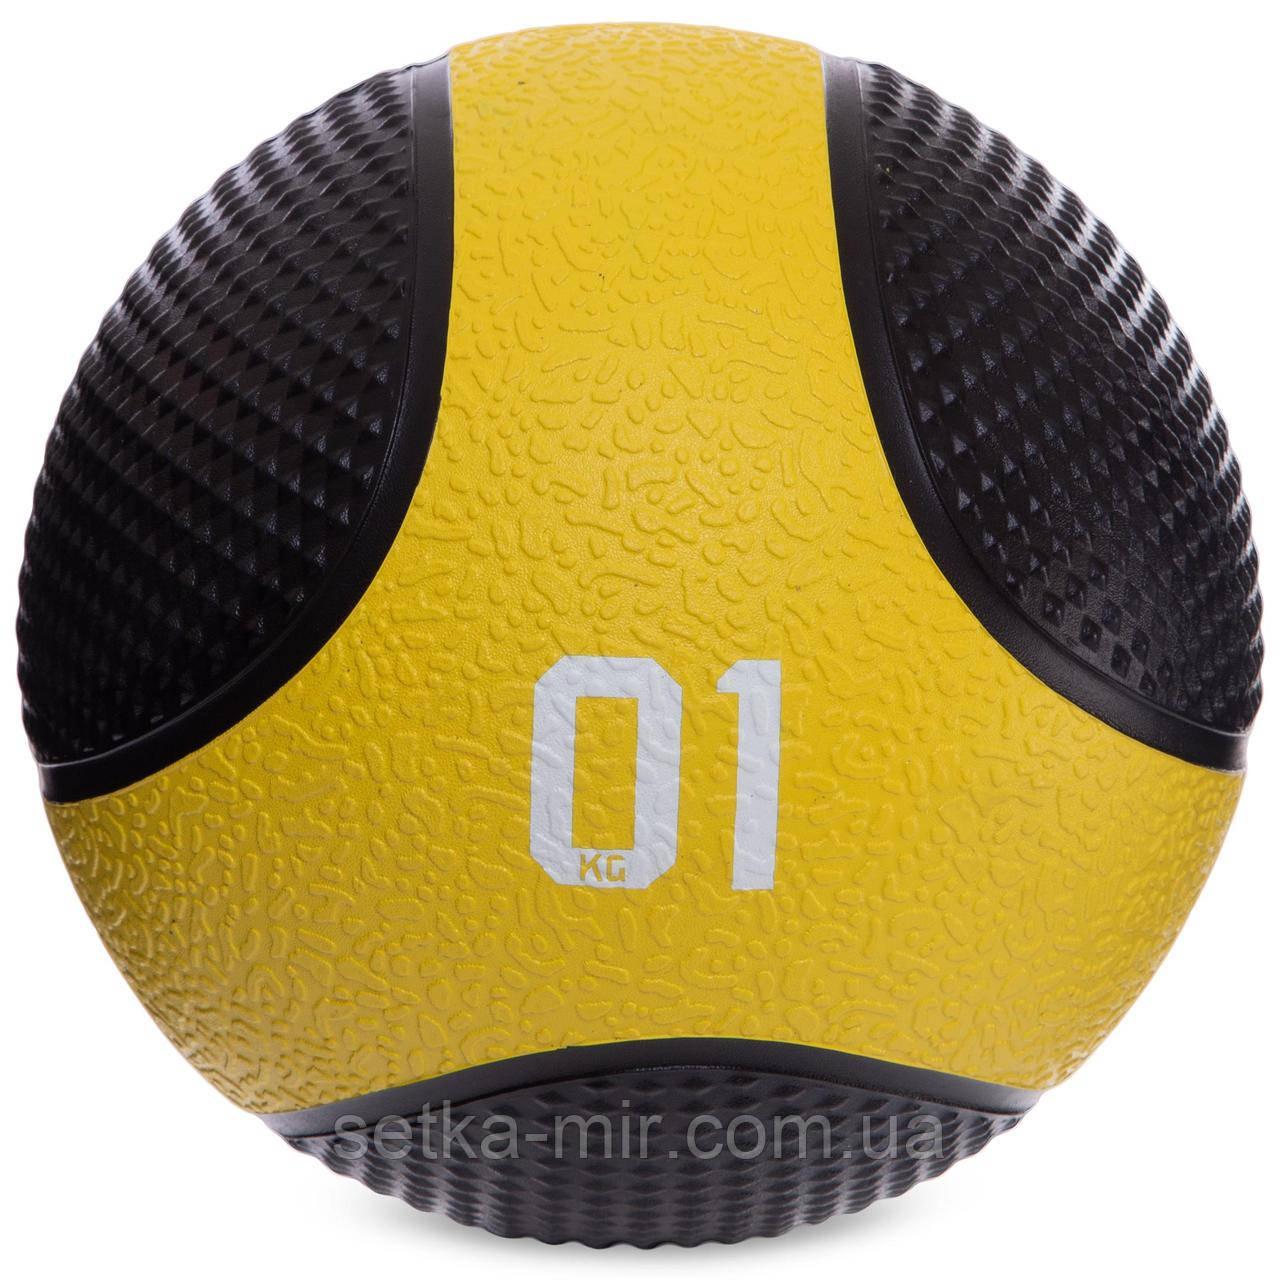 М'яч медичний медбол Medicine Ball FI-2824-1 1кг